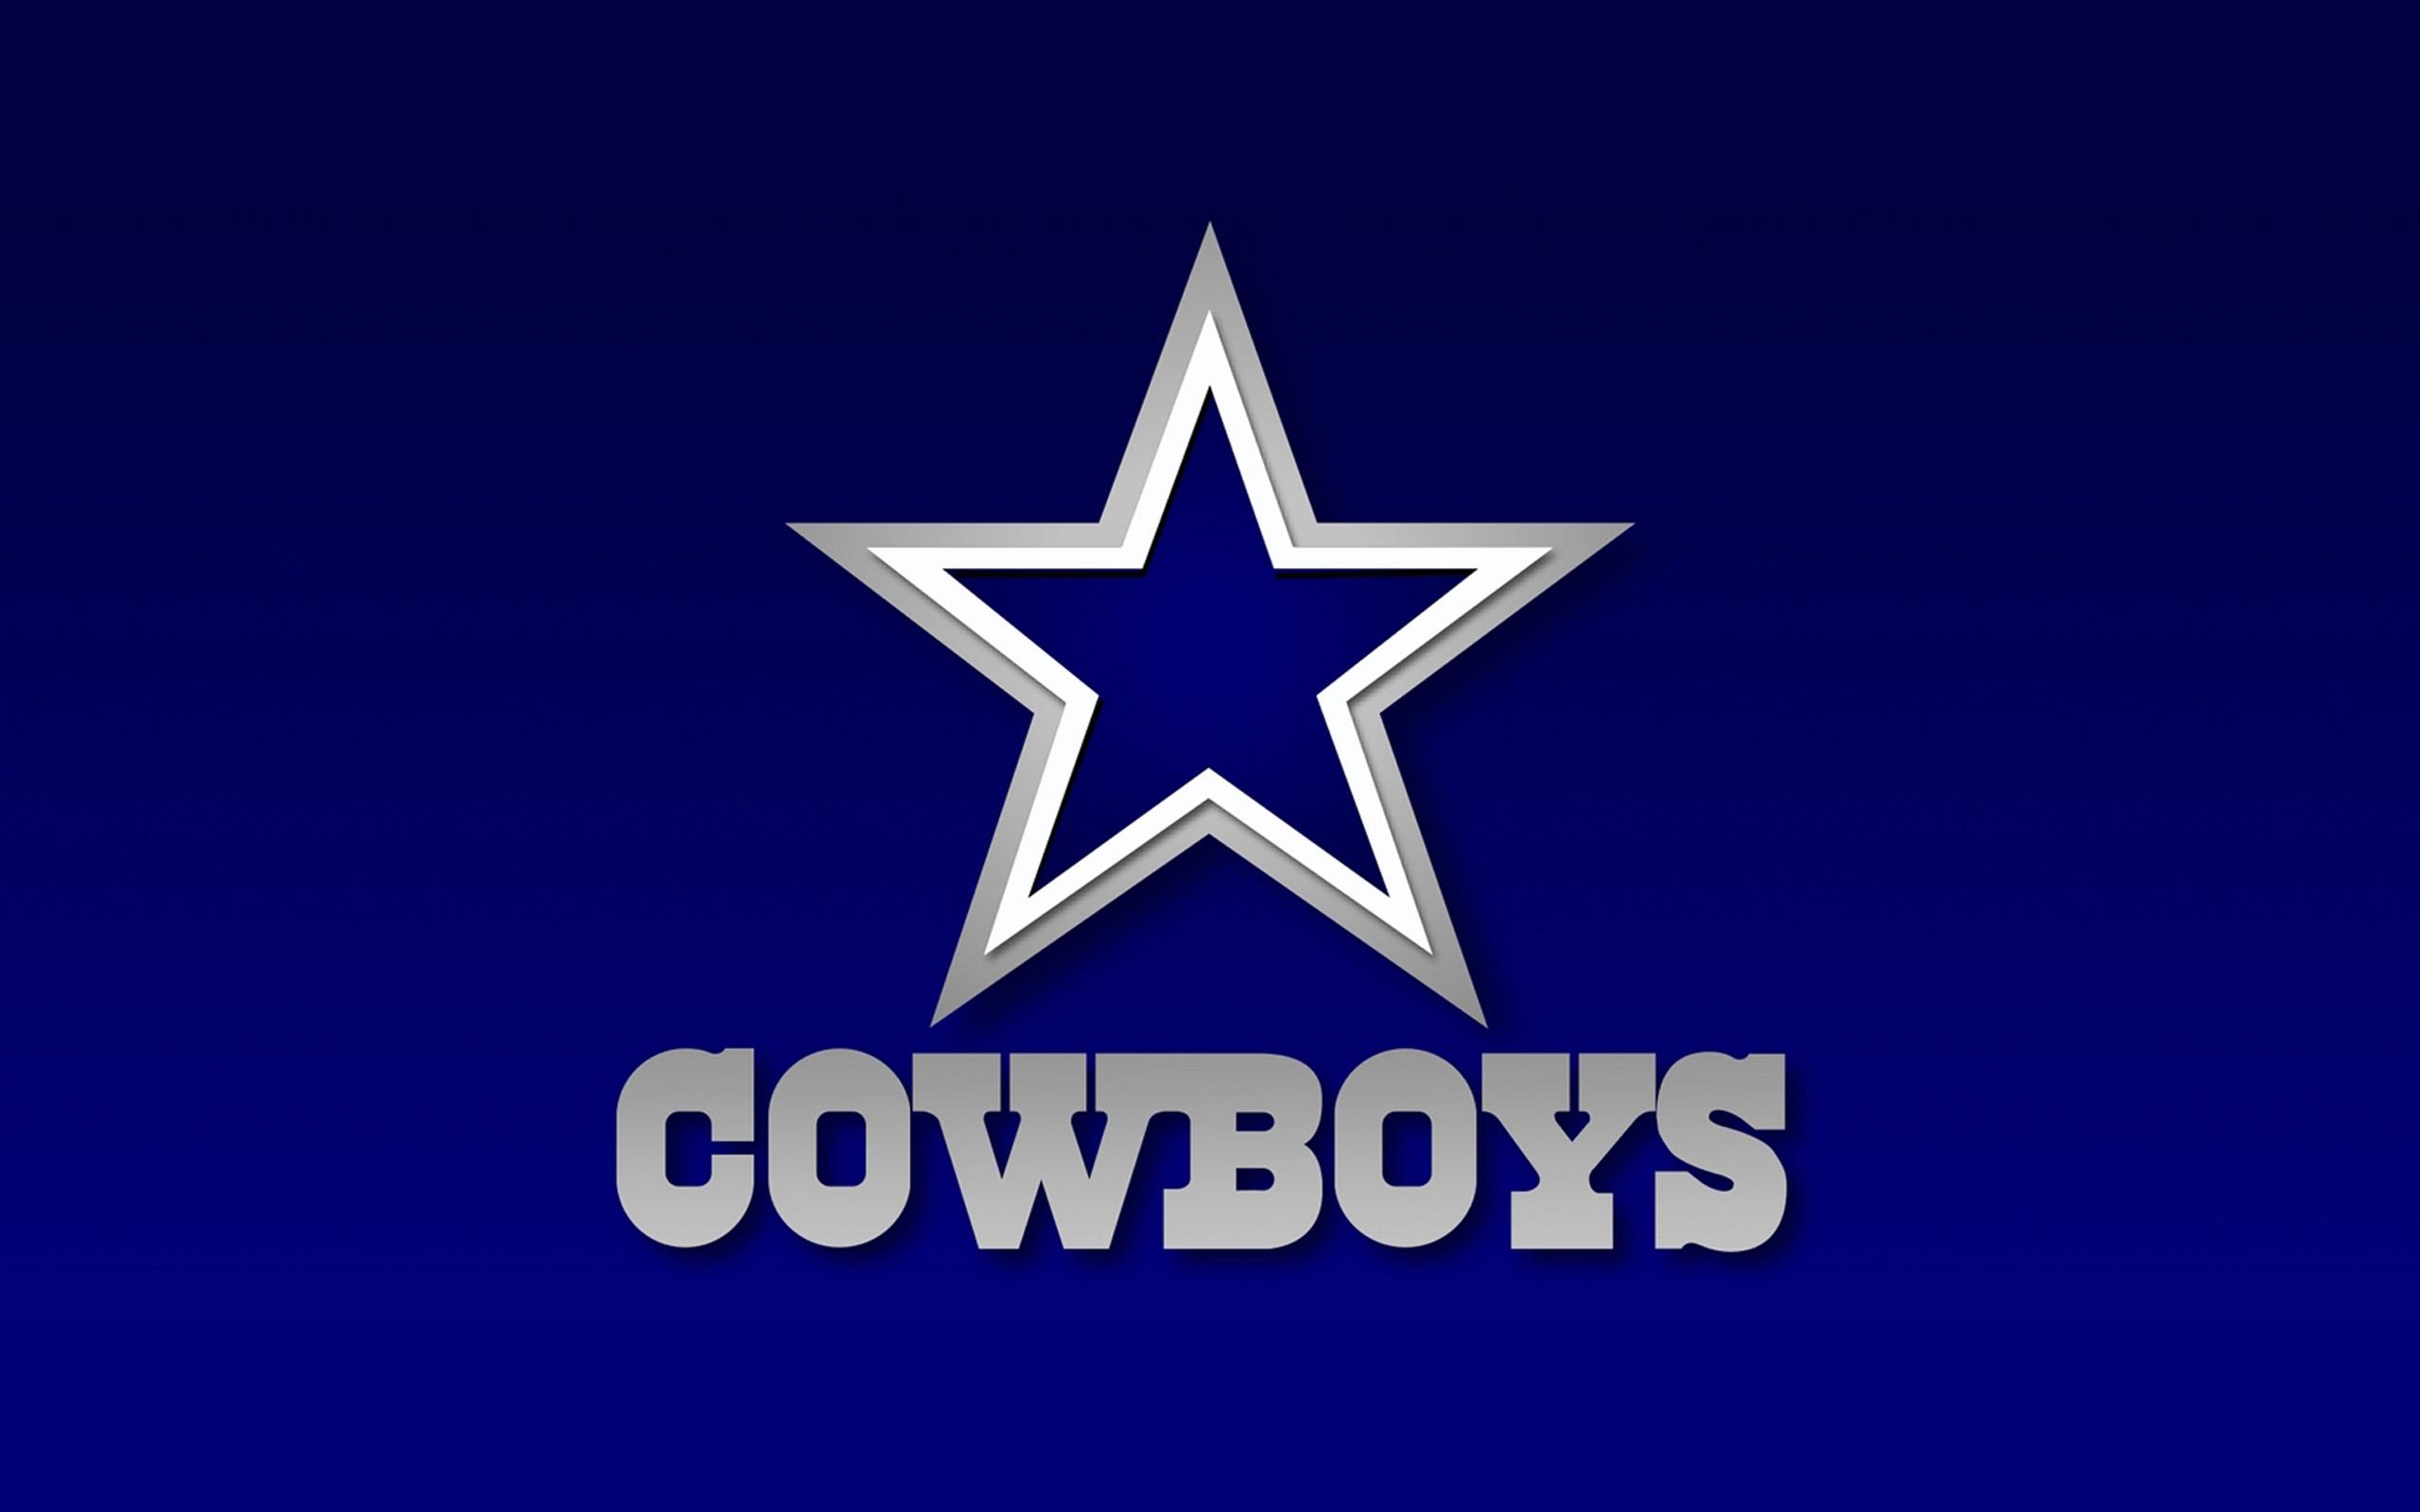 dallas cowboys star logo wallpaper danyalsak 2560x1600